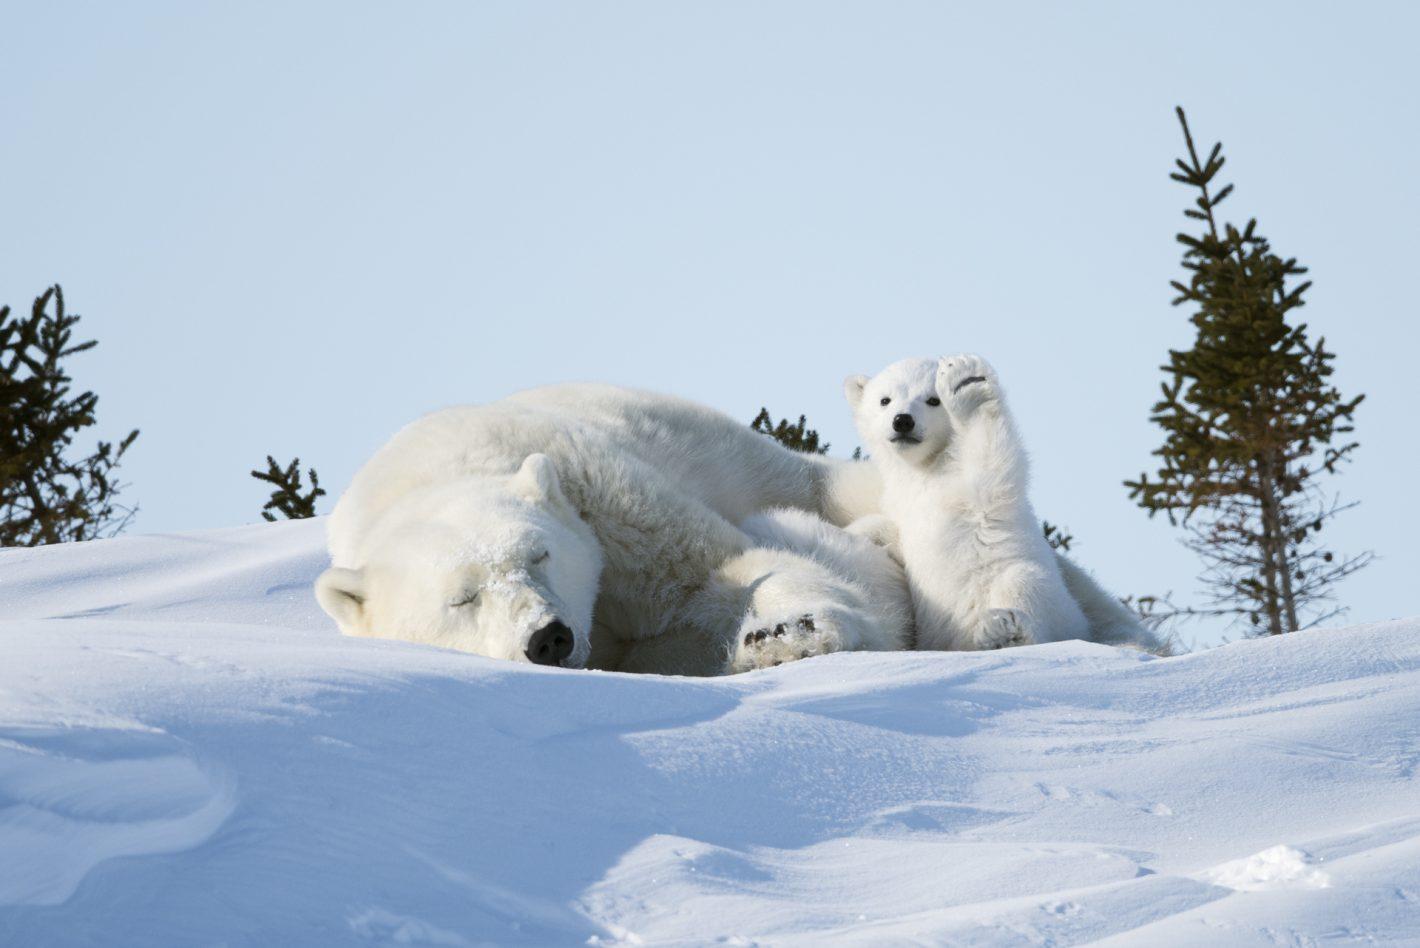 Wildlife Philip Marazzi Nikon